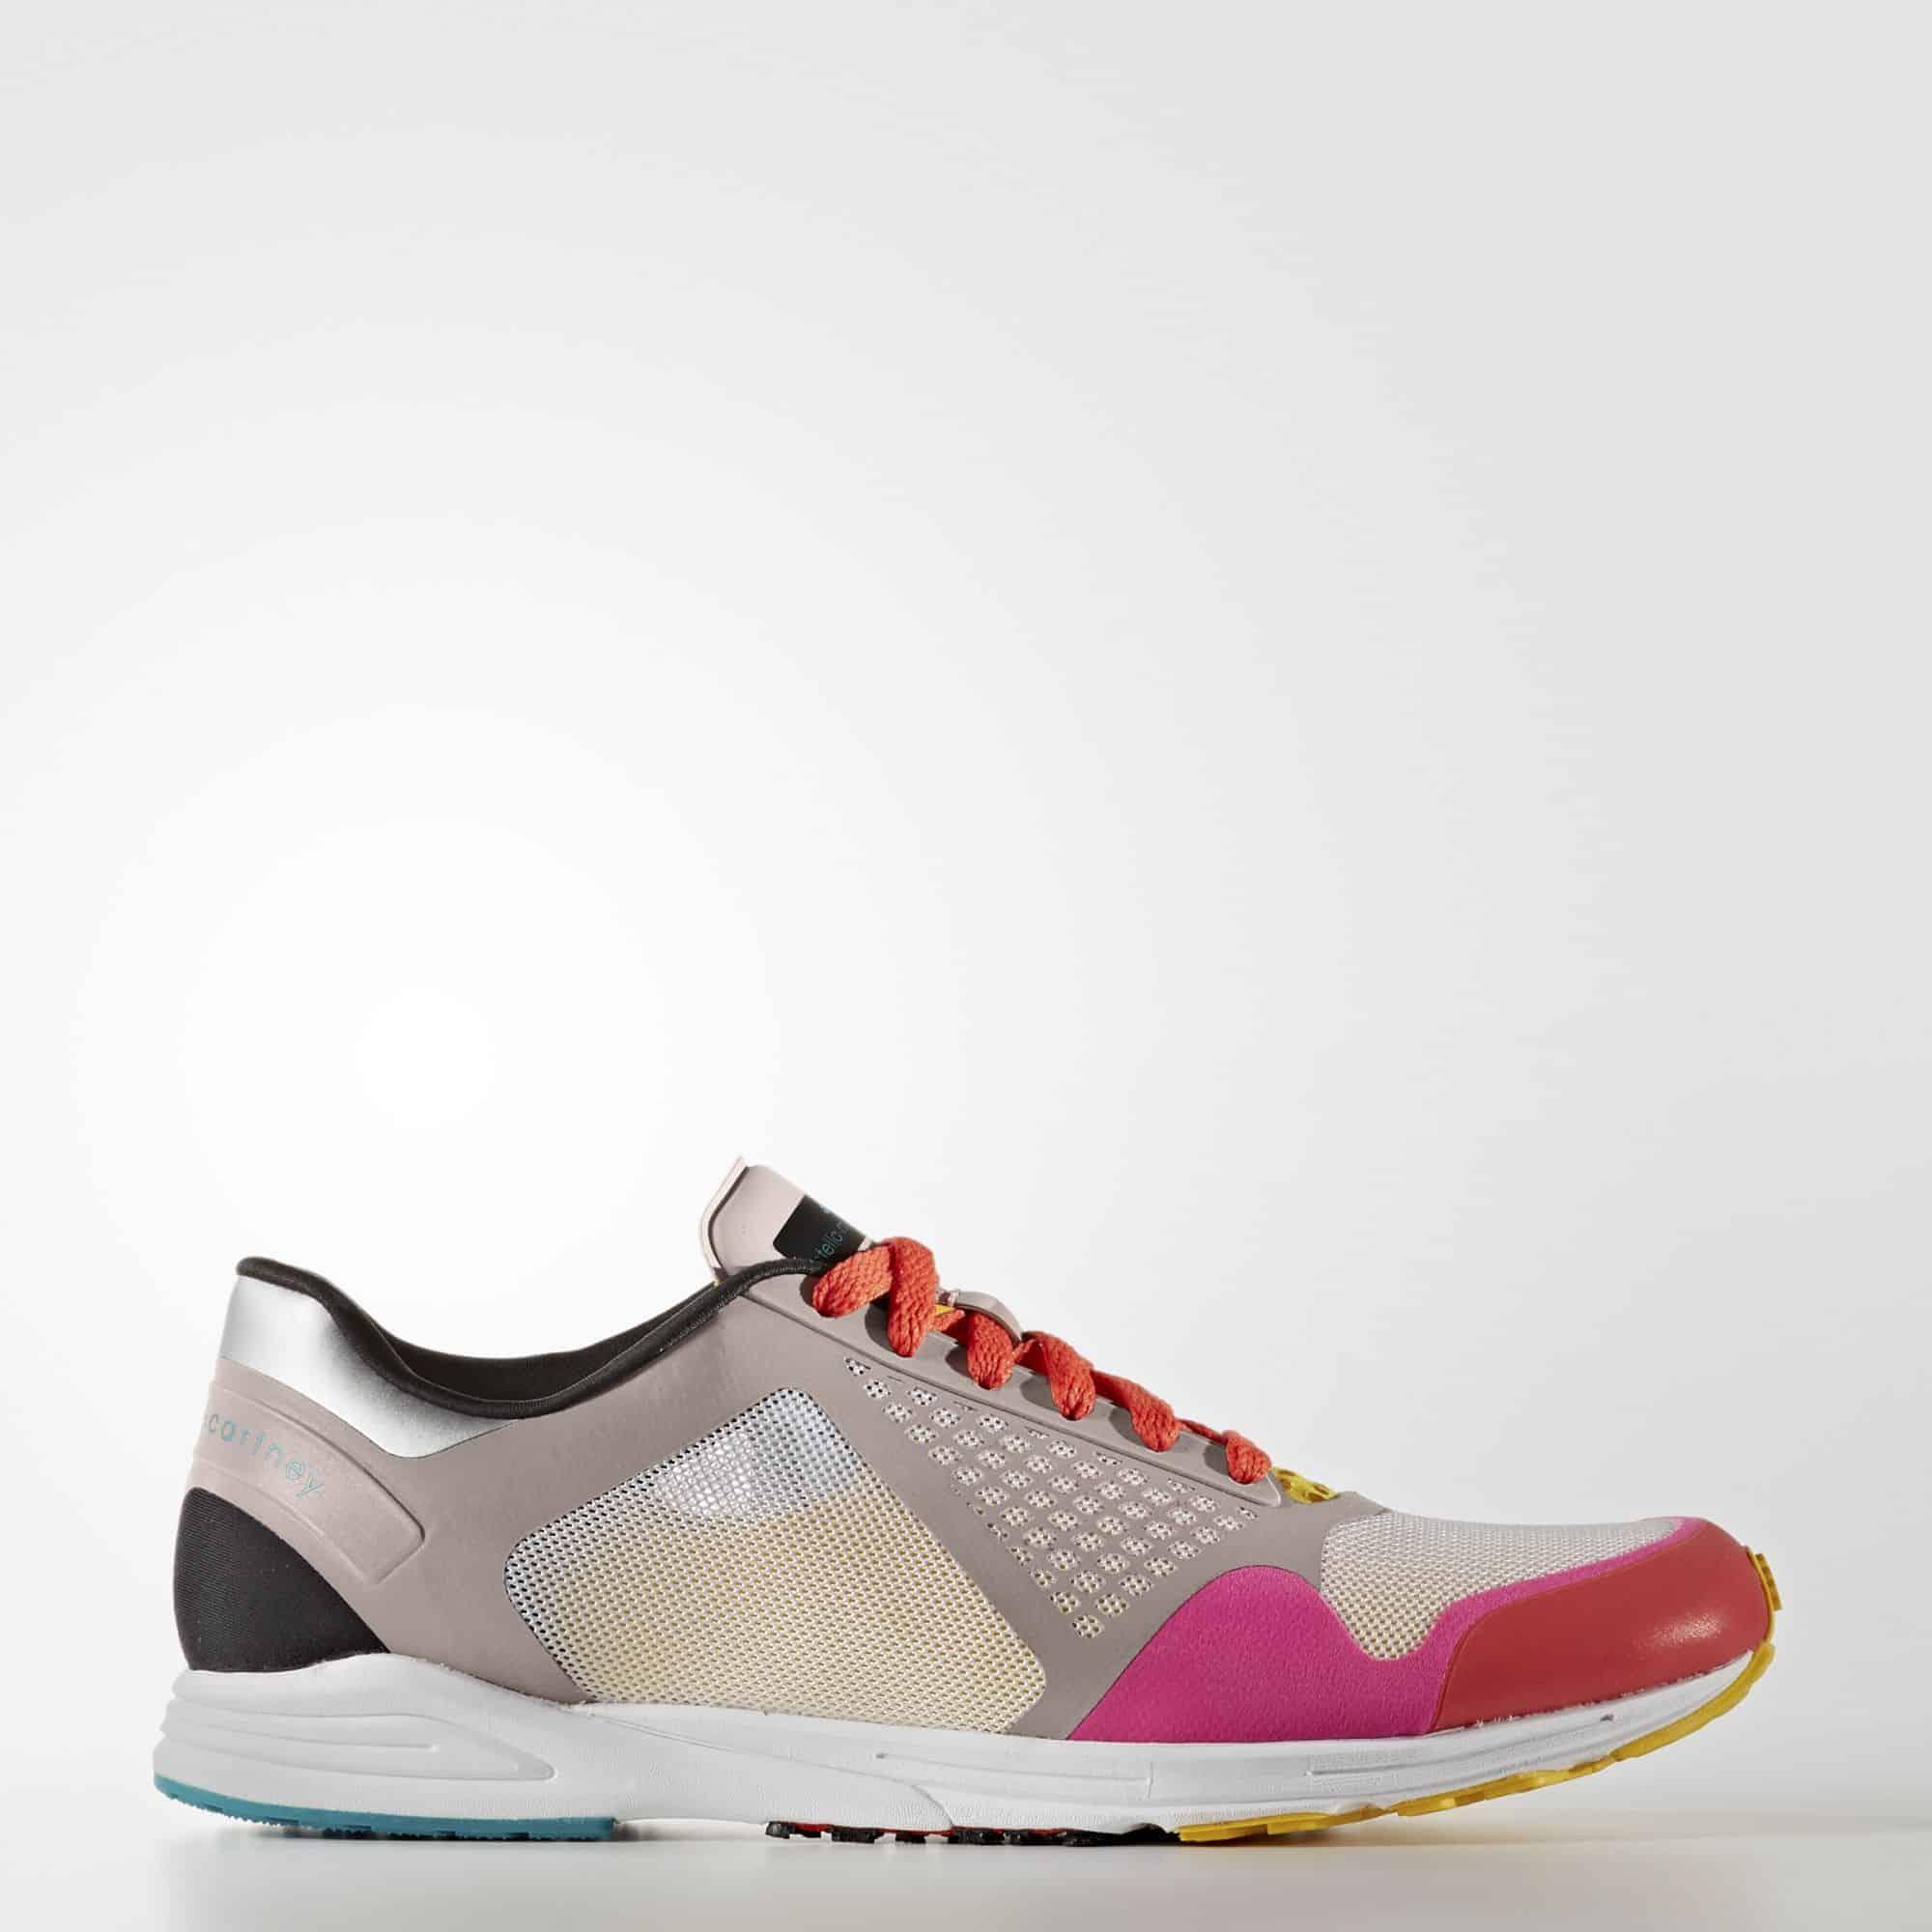 Кроссовки для бега Adidas Adizero Takumi by Stella McCartney женские